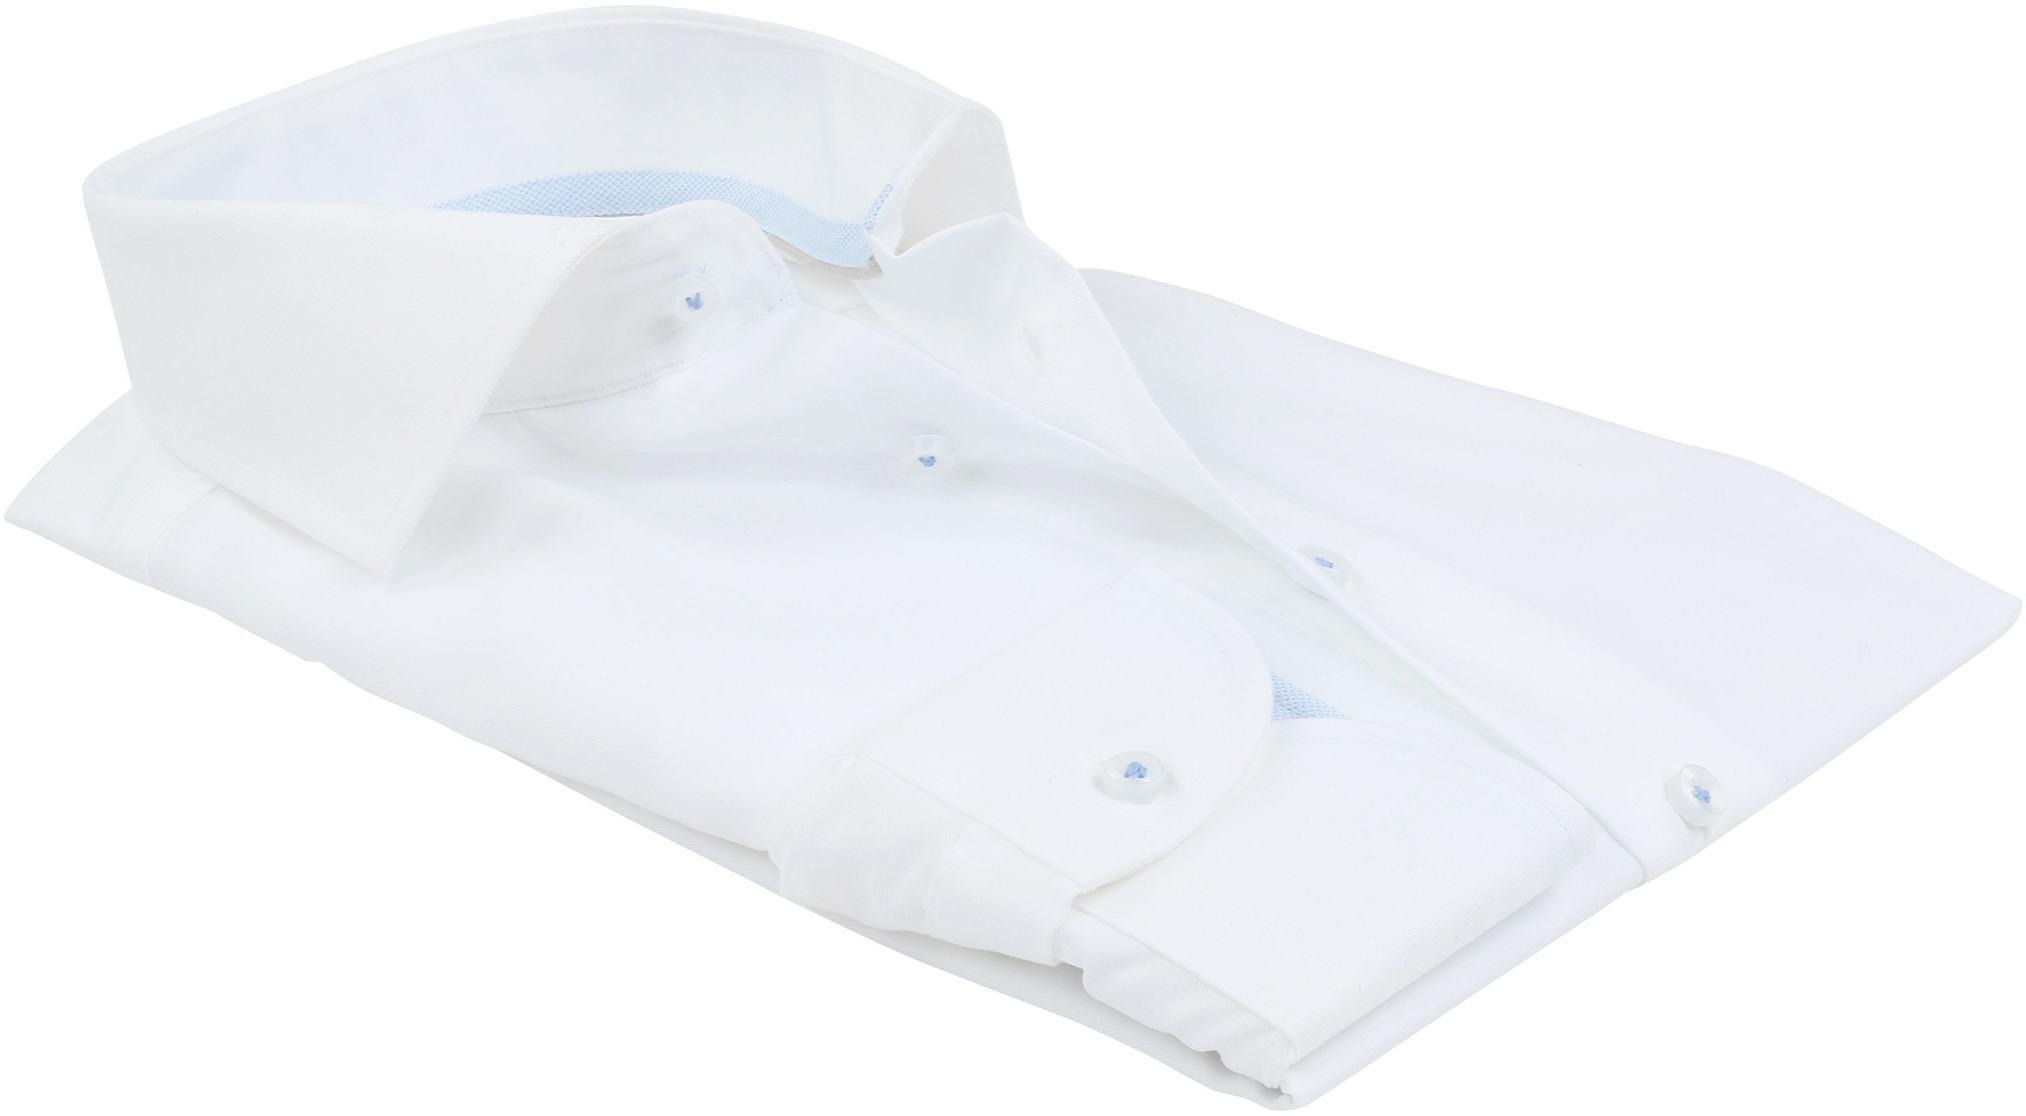 Profuomo Overhemd Strijkvrij Wit Blauw foto 3